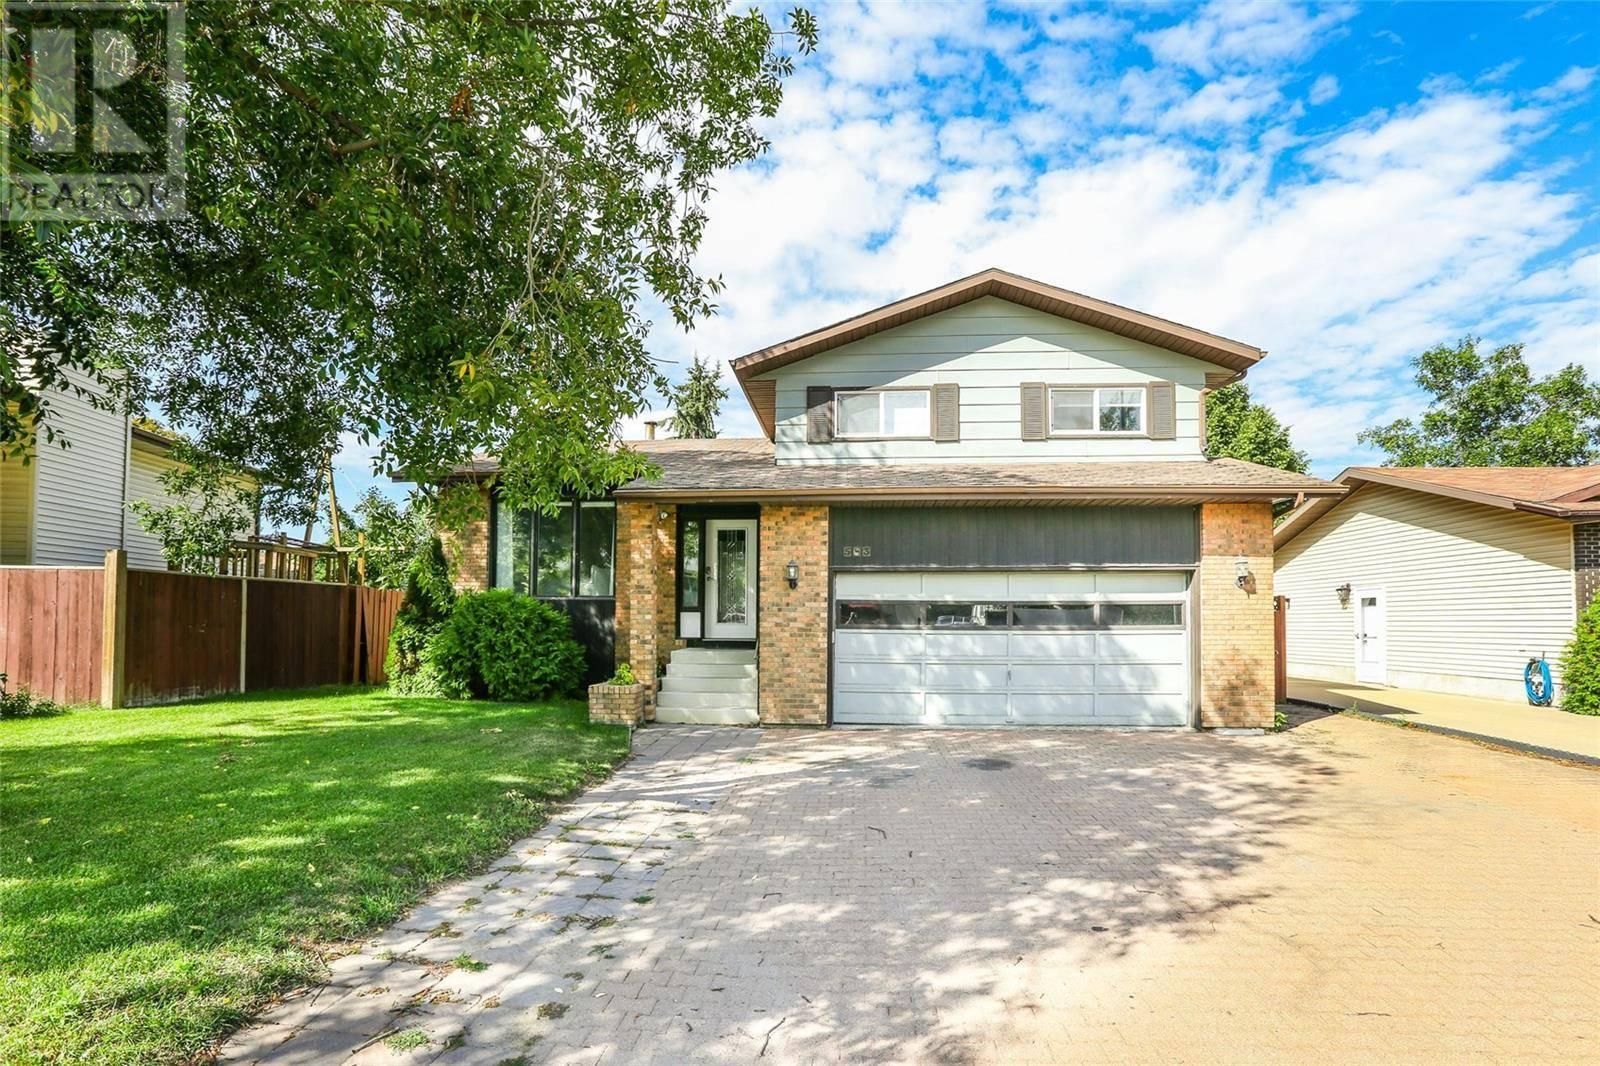 House for sale at 563 Sebestyen Cres Saskatoon Saskatchewan - MLS: SK783332